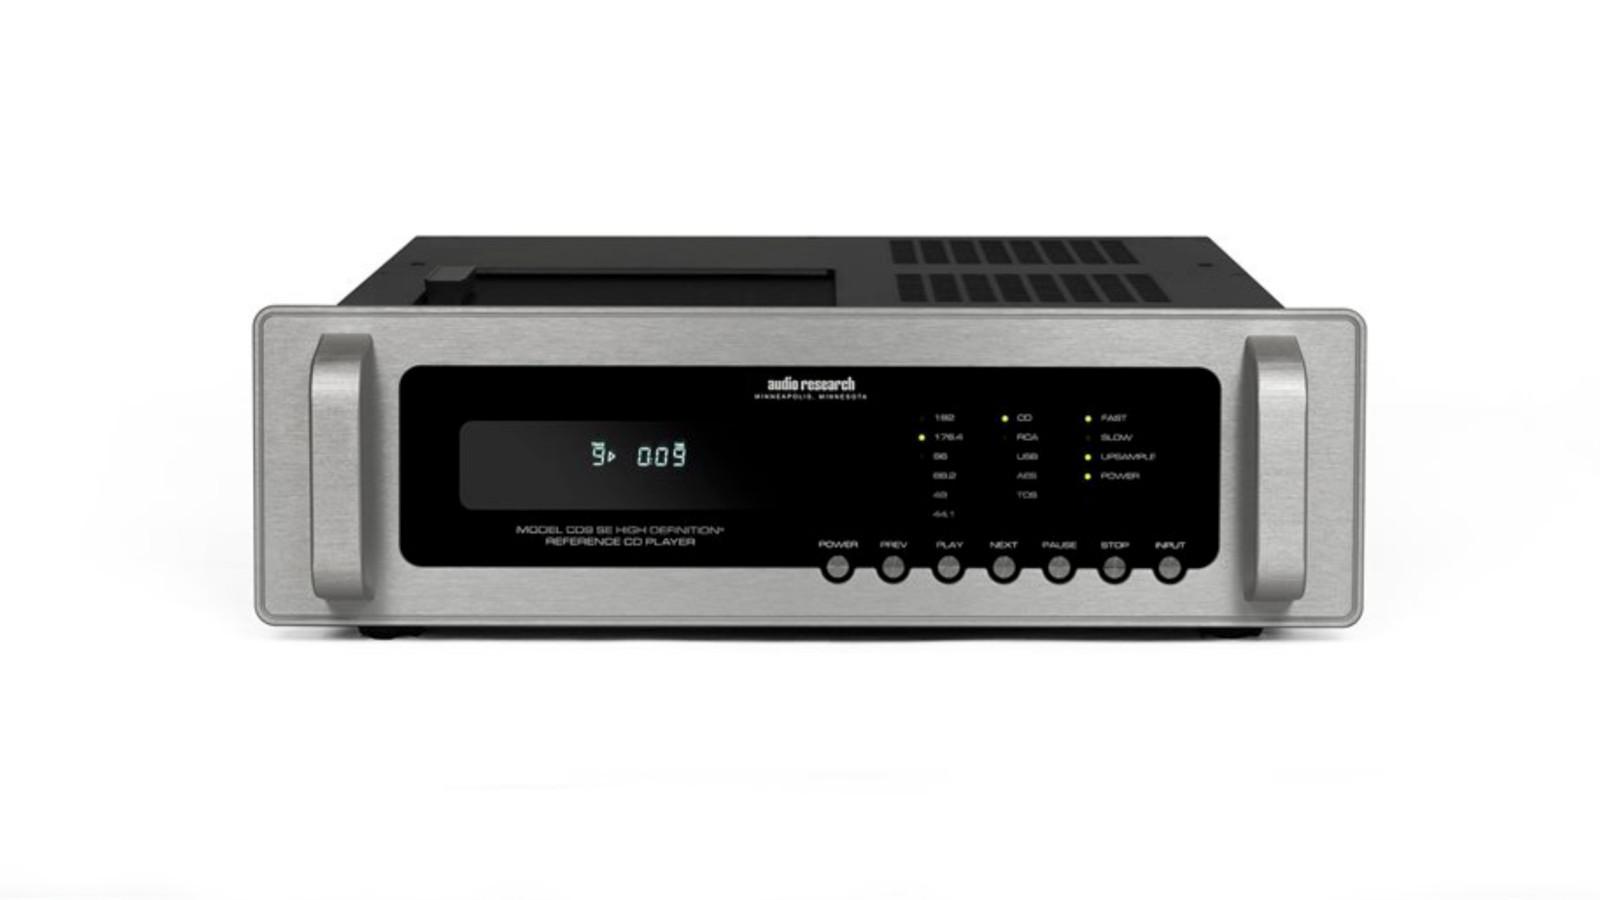 audio-research-cd9se